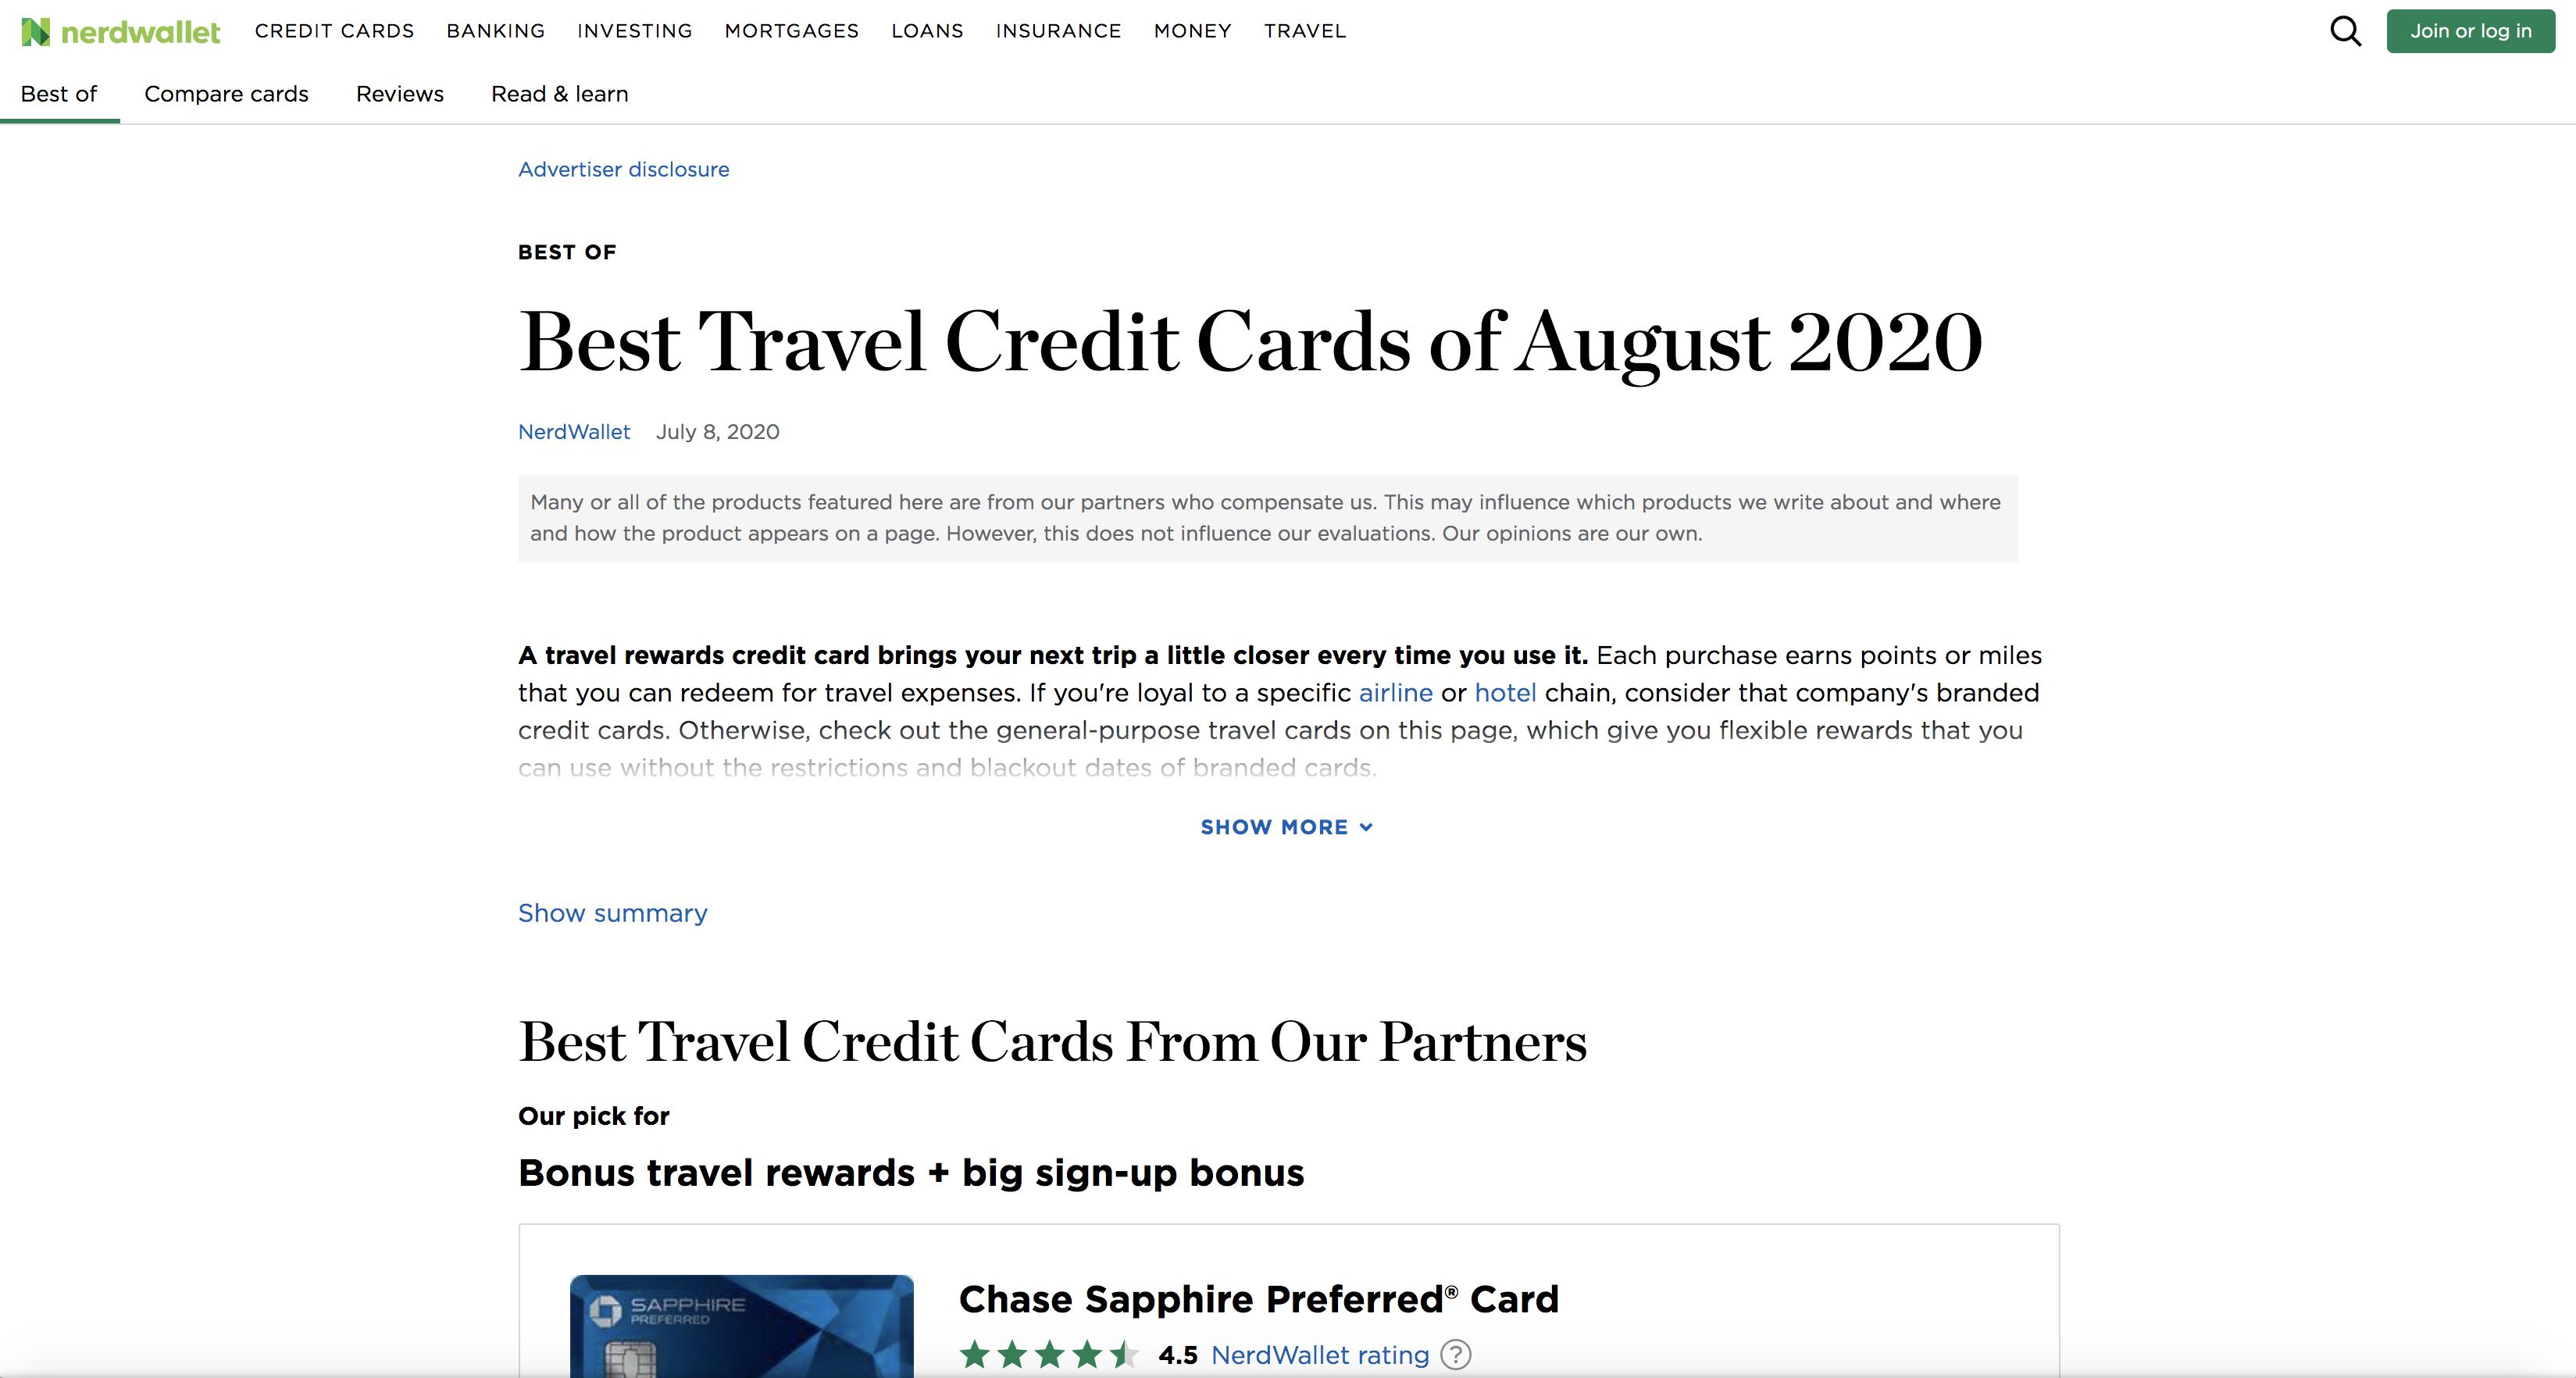 NerdWallet Best Travel Credit Cards Article Screenshot